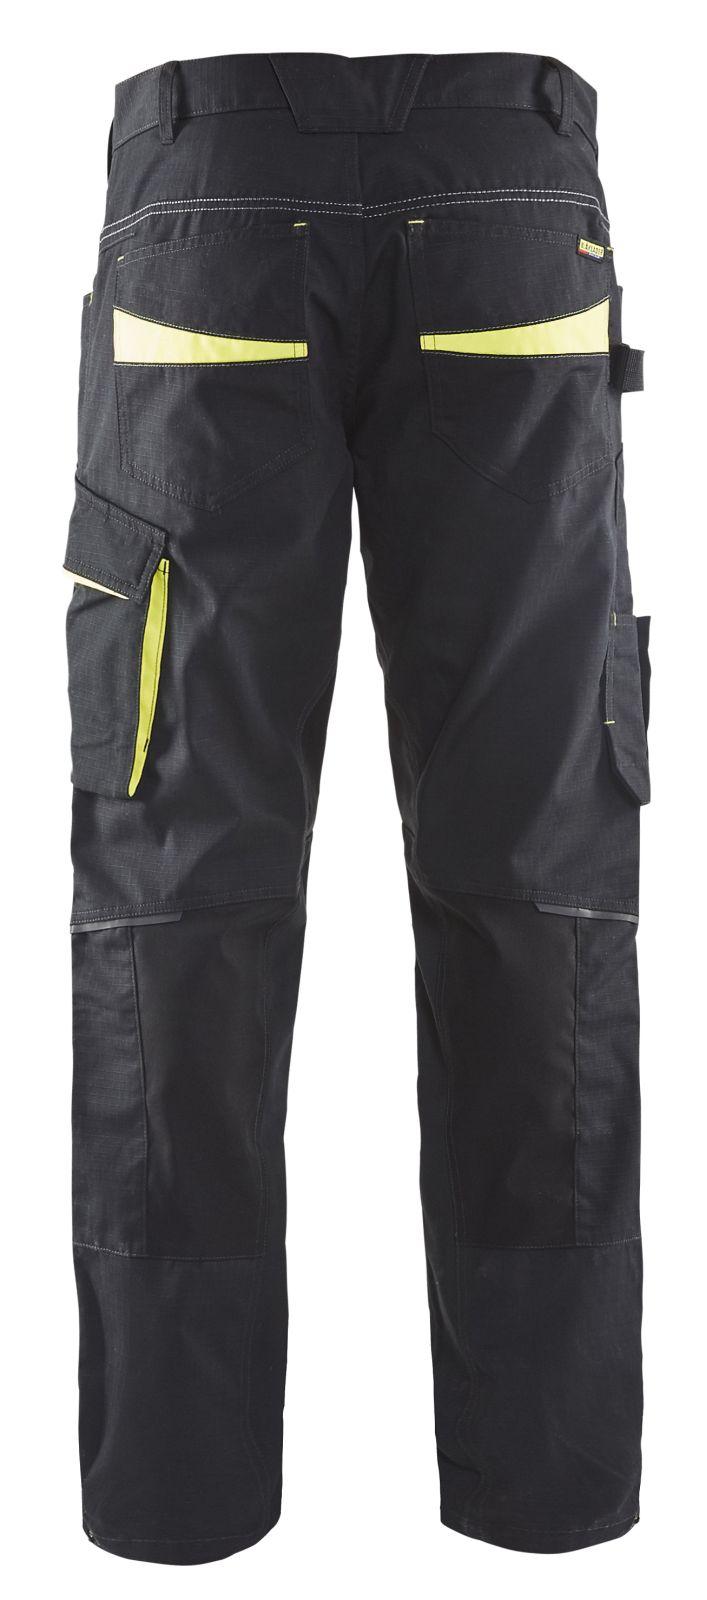 Blaklader Werkbroeken 14951330 met Stretch zwart-geel(9933)